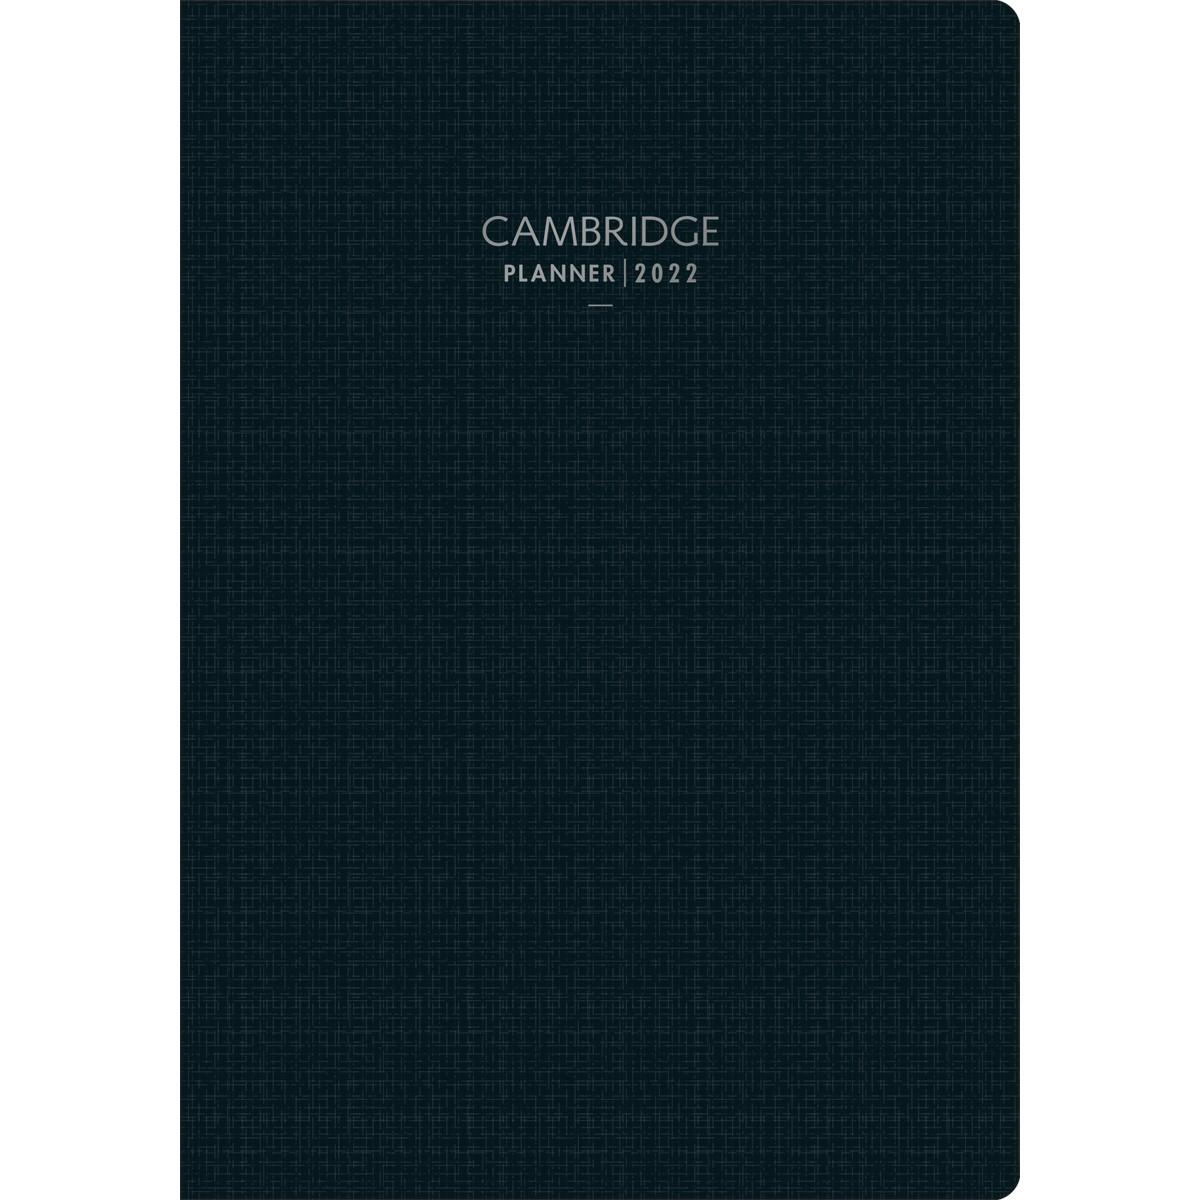 Planner Cambridge 2022 - Tilibra